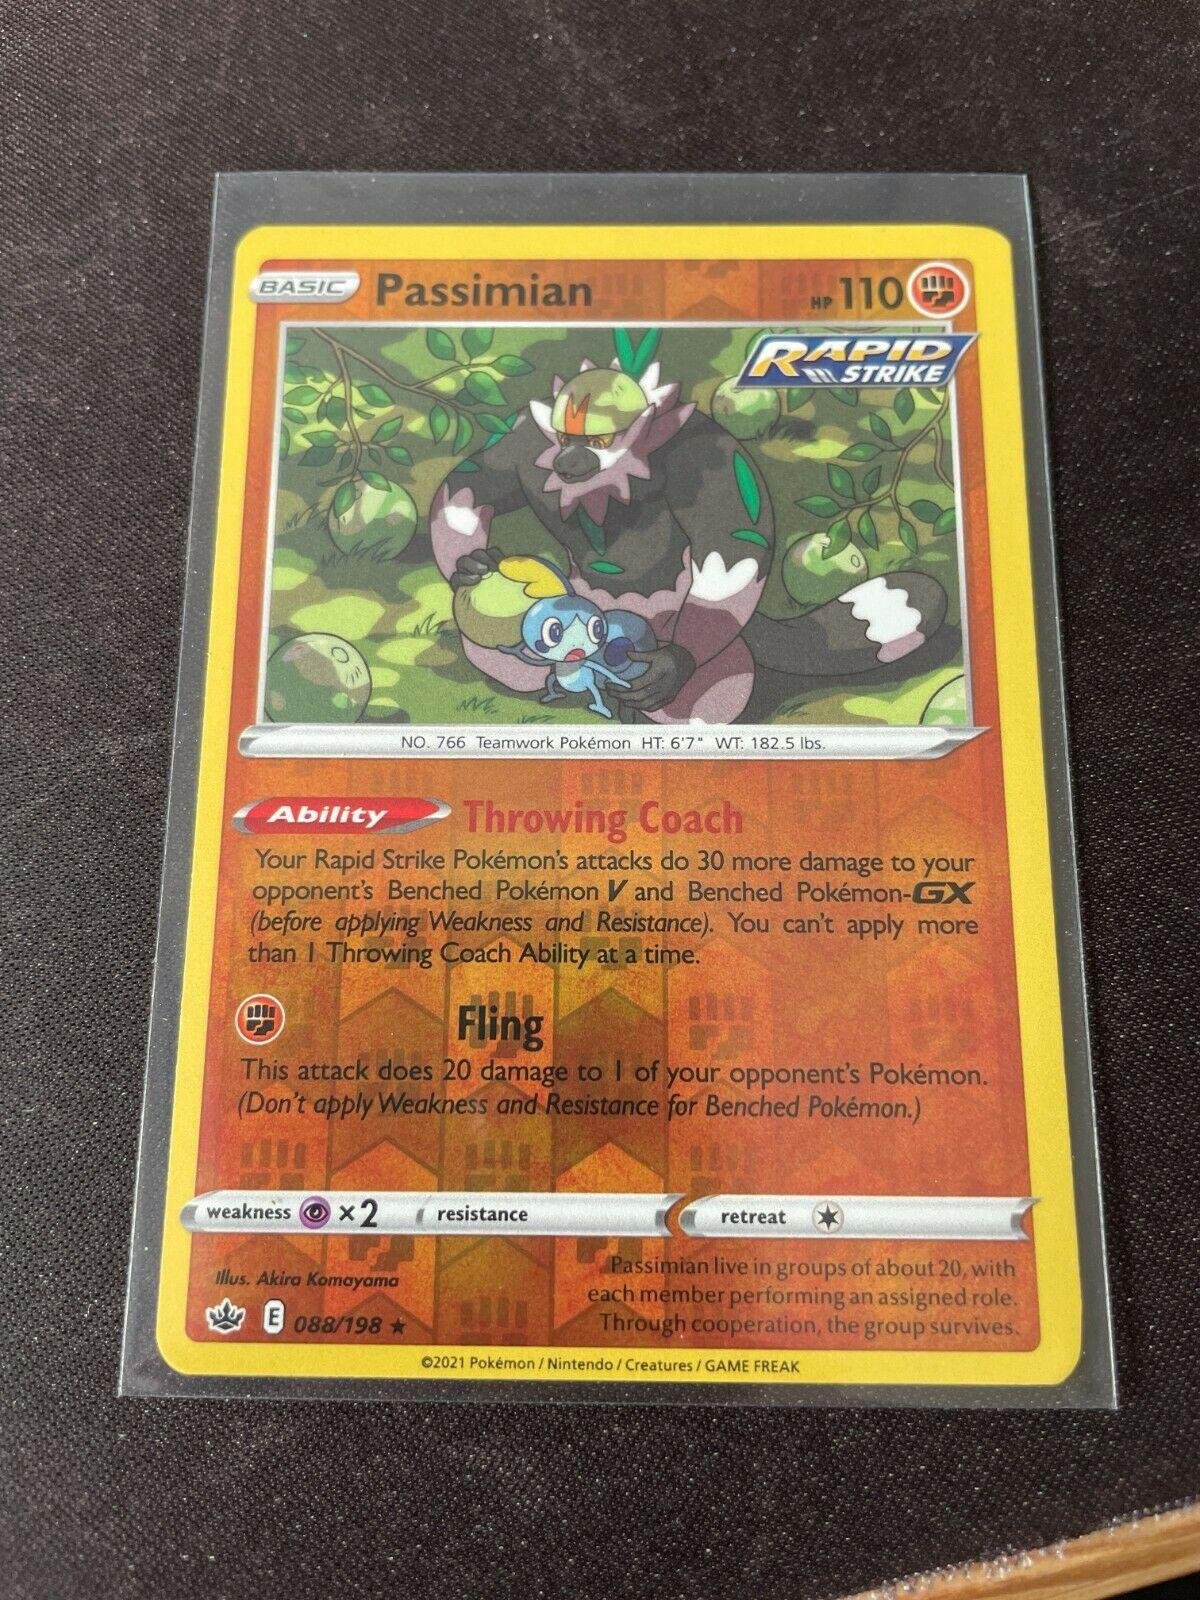 Pokemon TCG Chilling Reign 088/198 Passimian Card Fresh Reverse Holo Mint Rare